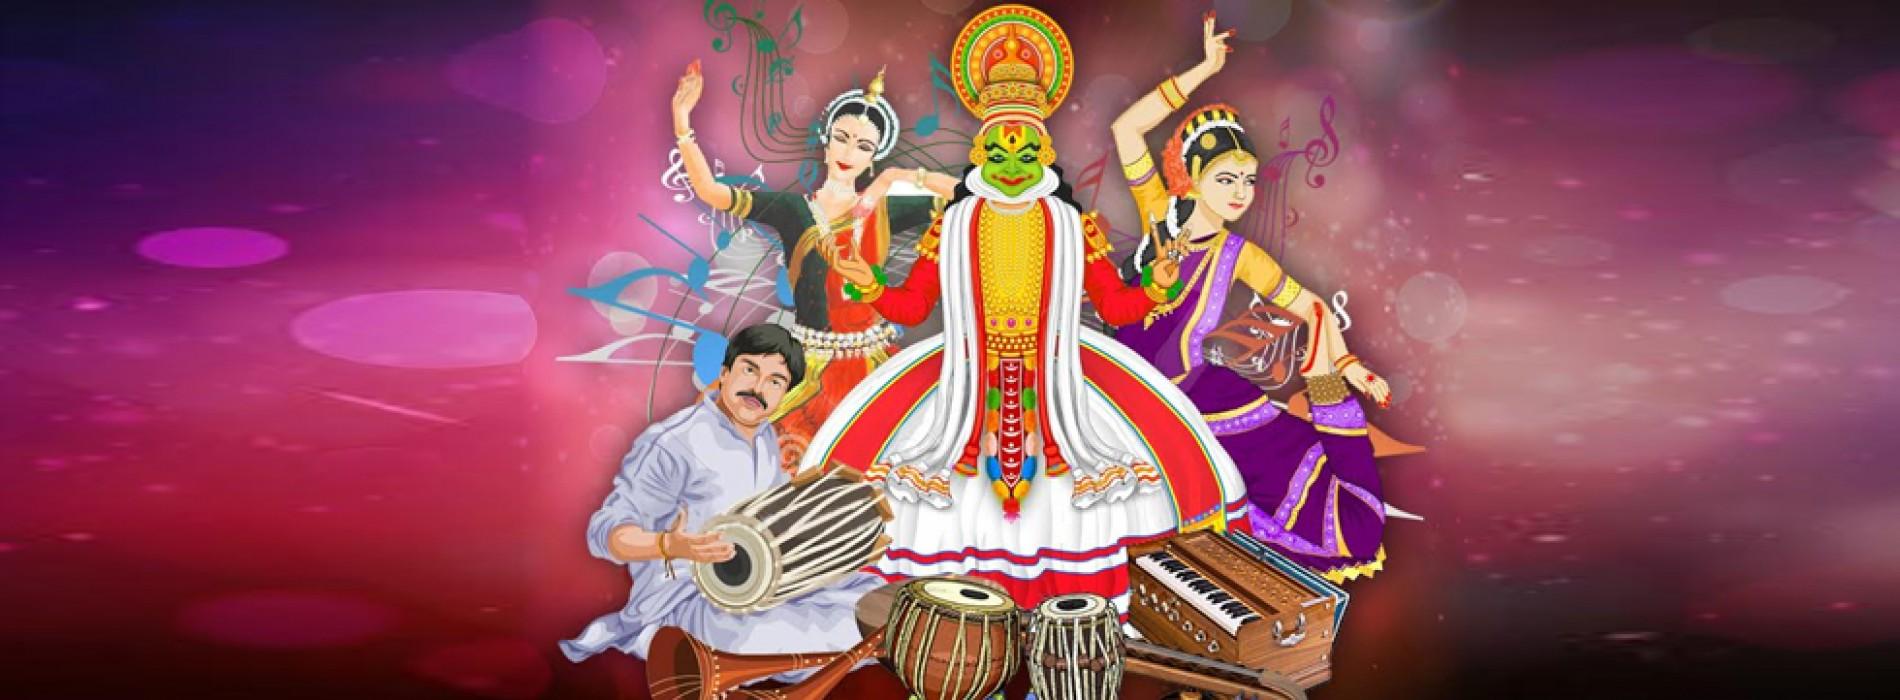 The Tamara Coorg returns with its much awaited annual cultural extravaganza – The Tamara Carnival